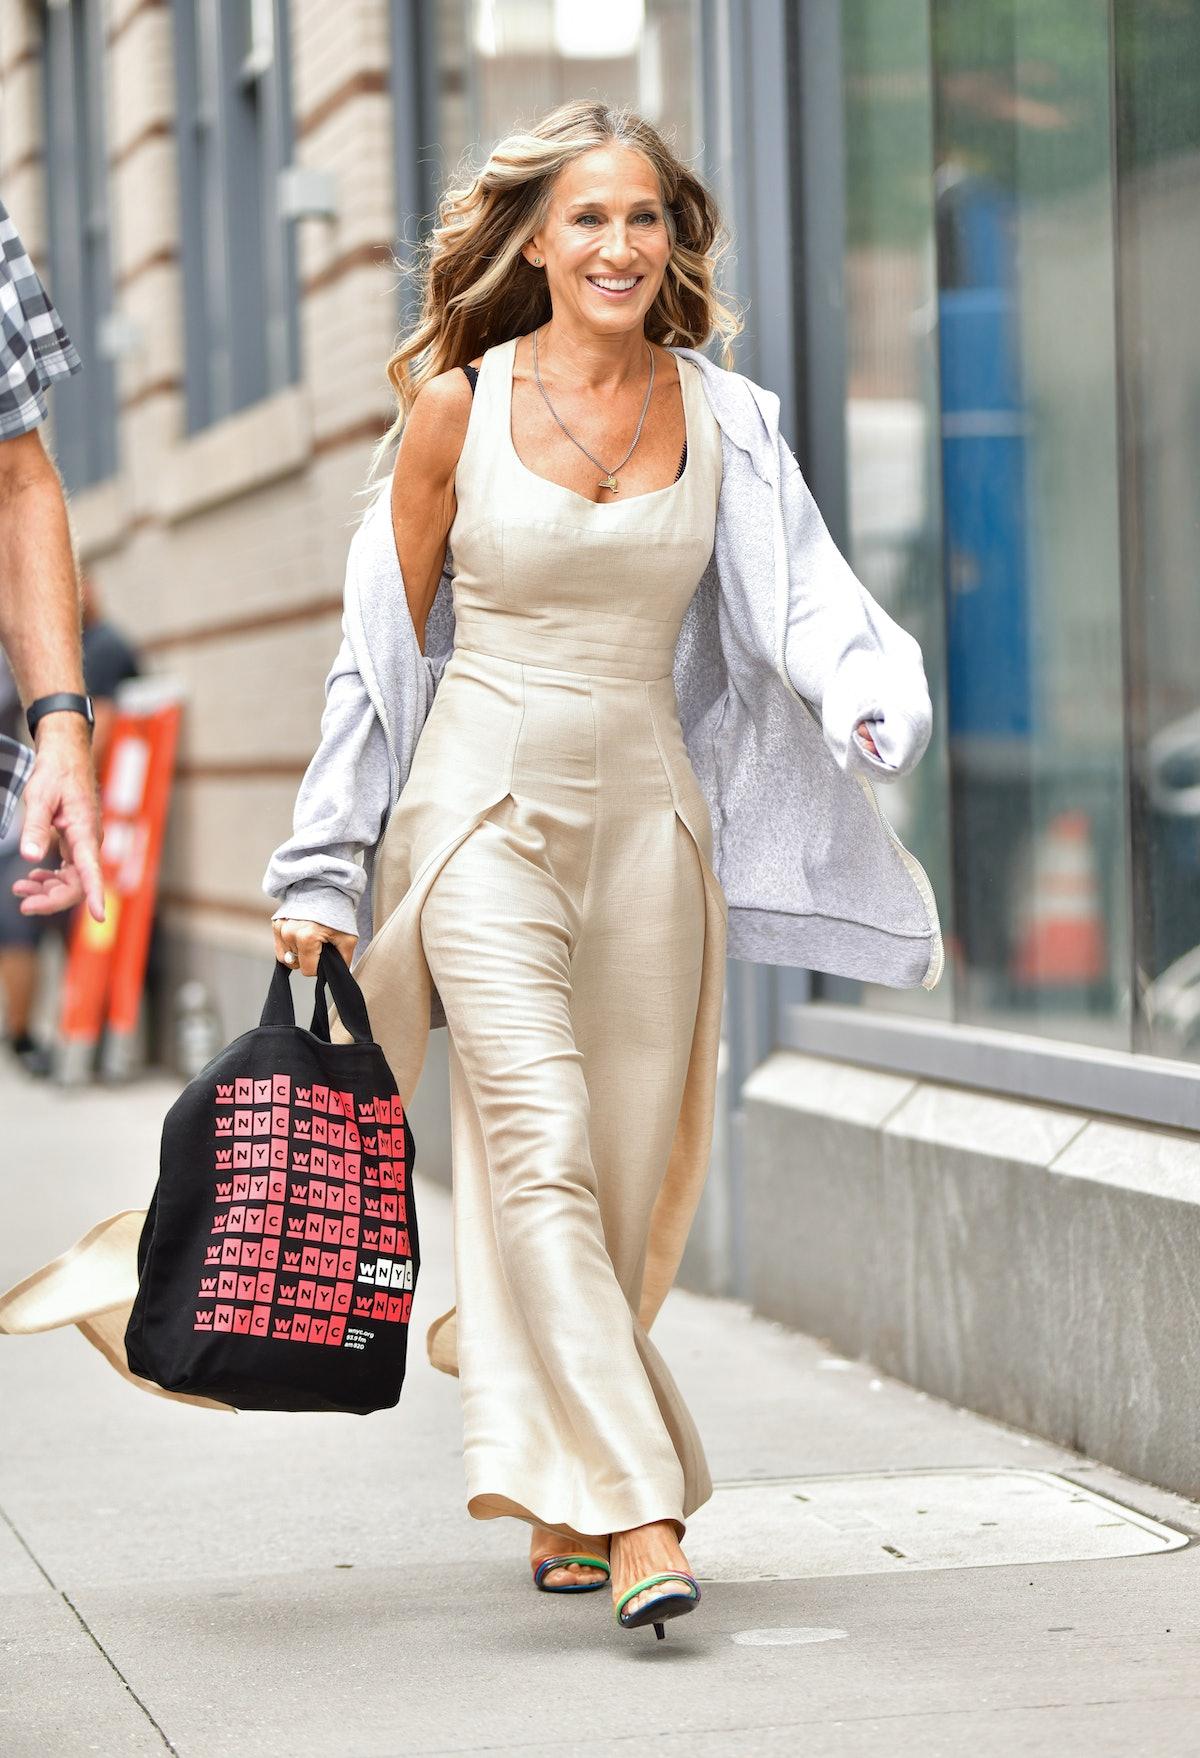 SJP with the same WNYC tote bag.